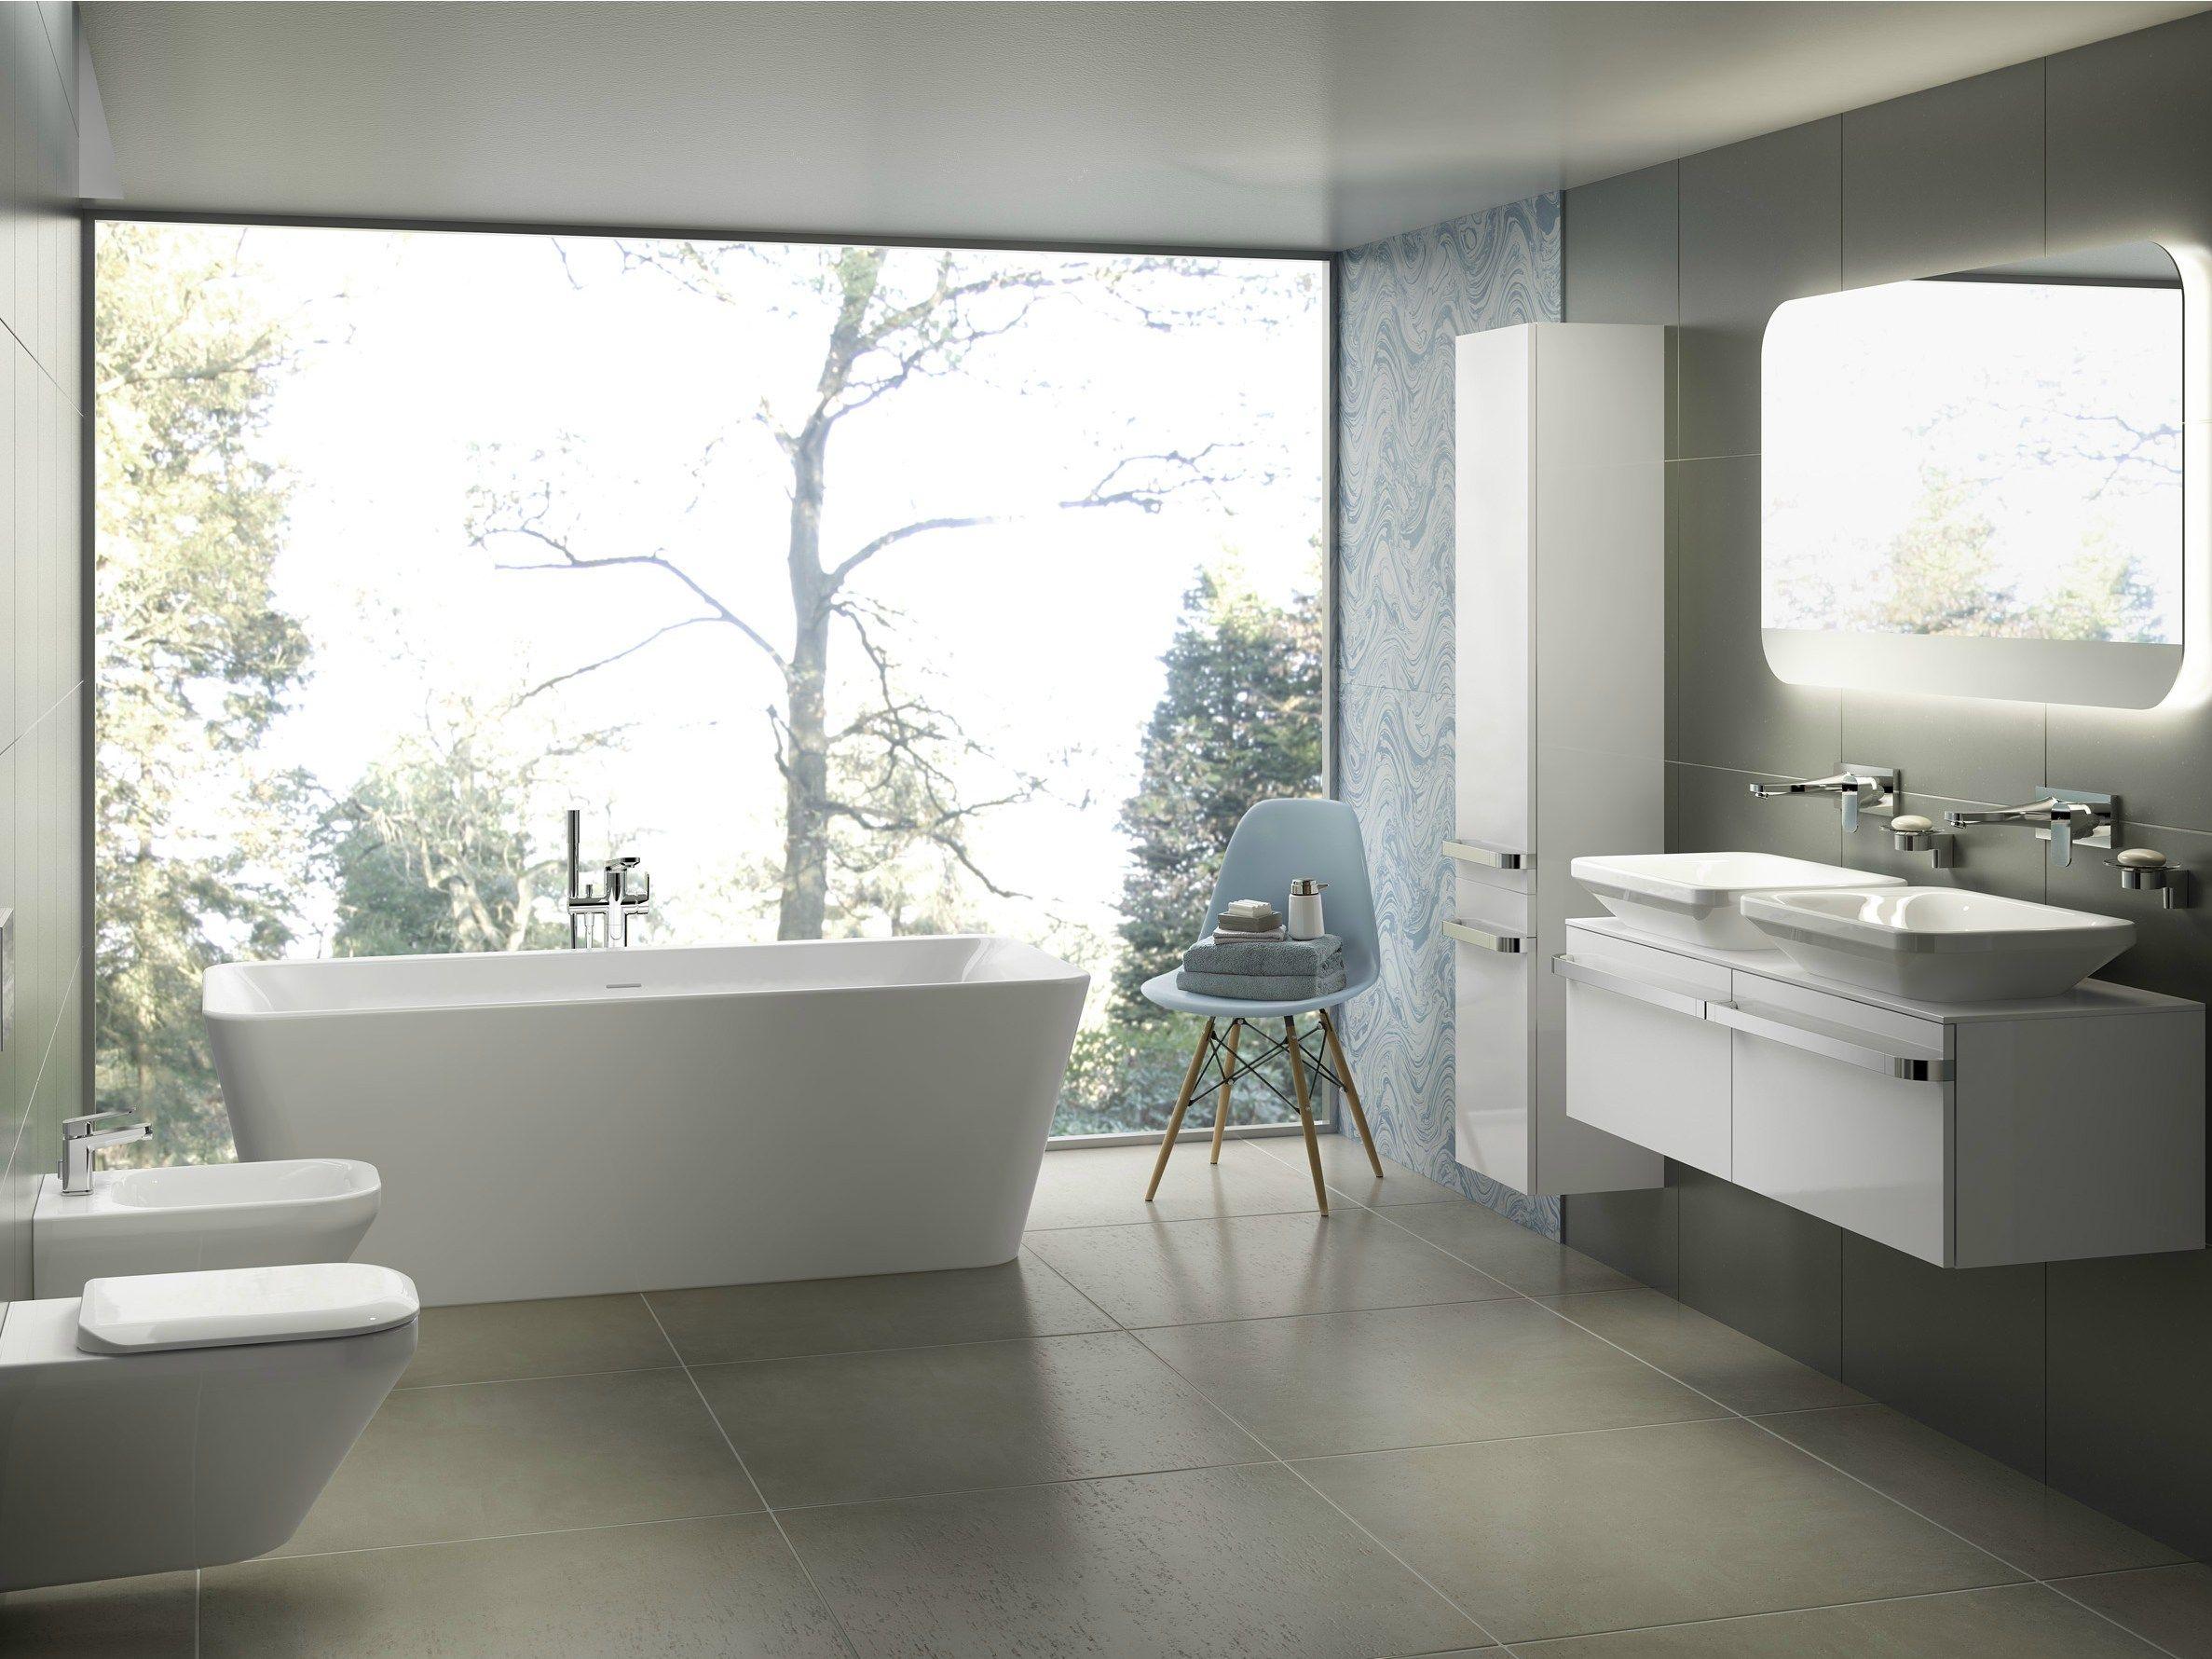 Arredo bagno completo tonic ii by ideal standard italia for Arredo bagno completo